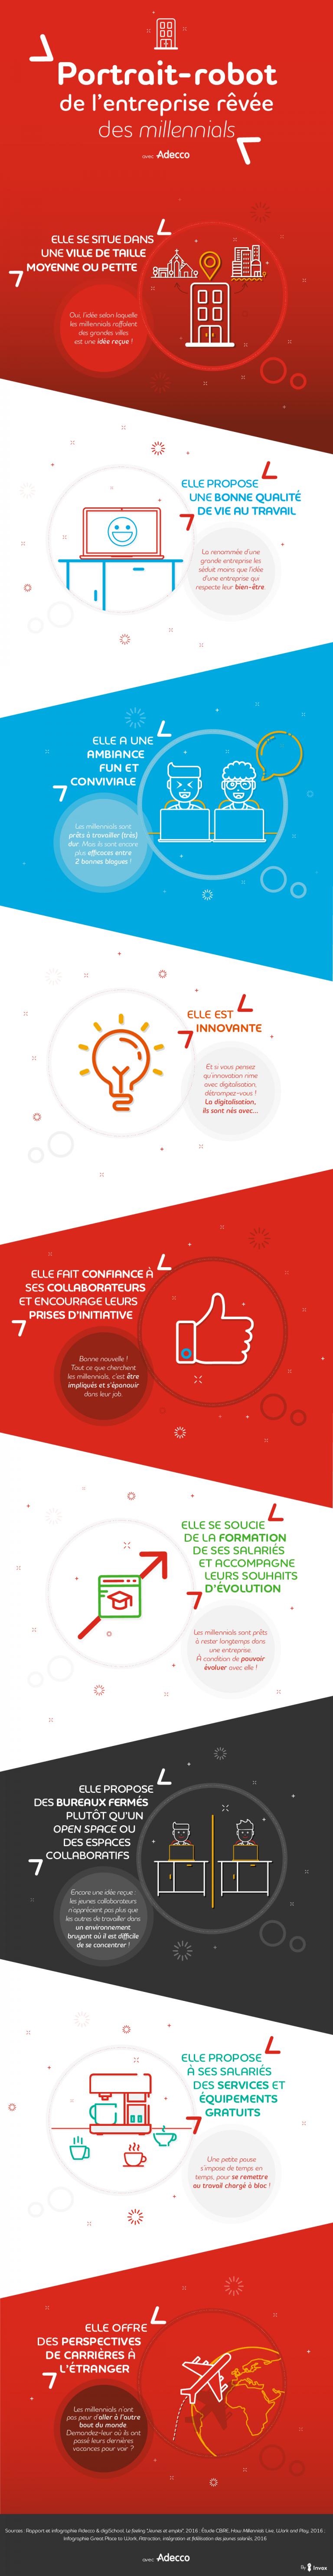 infographie-entreprise-millennials